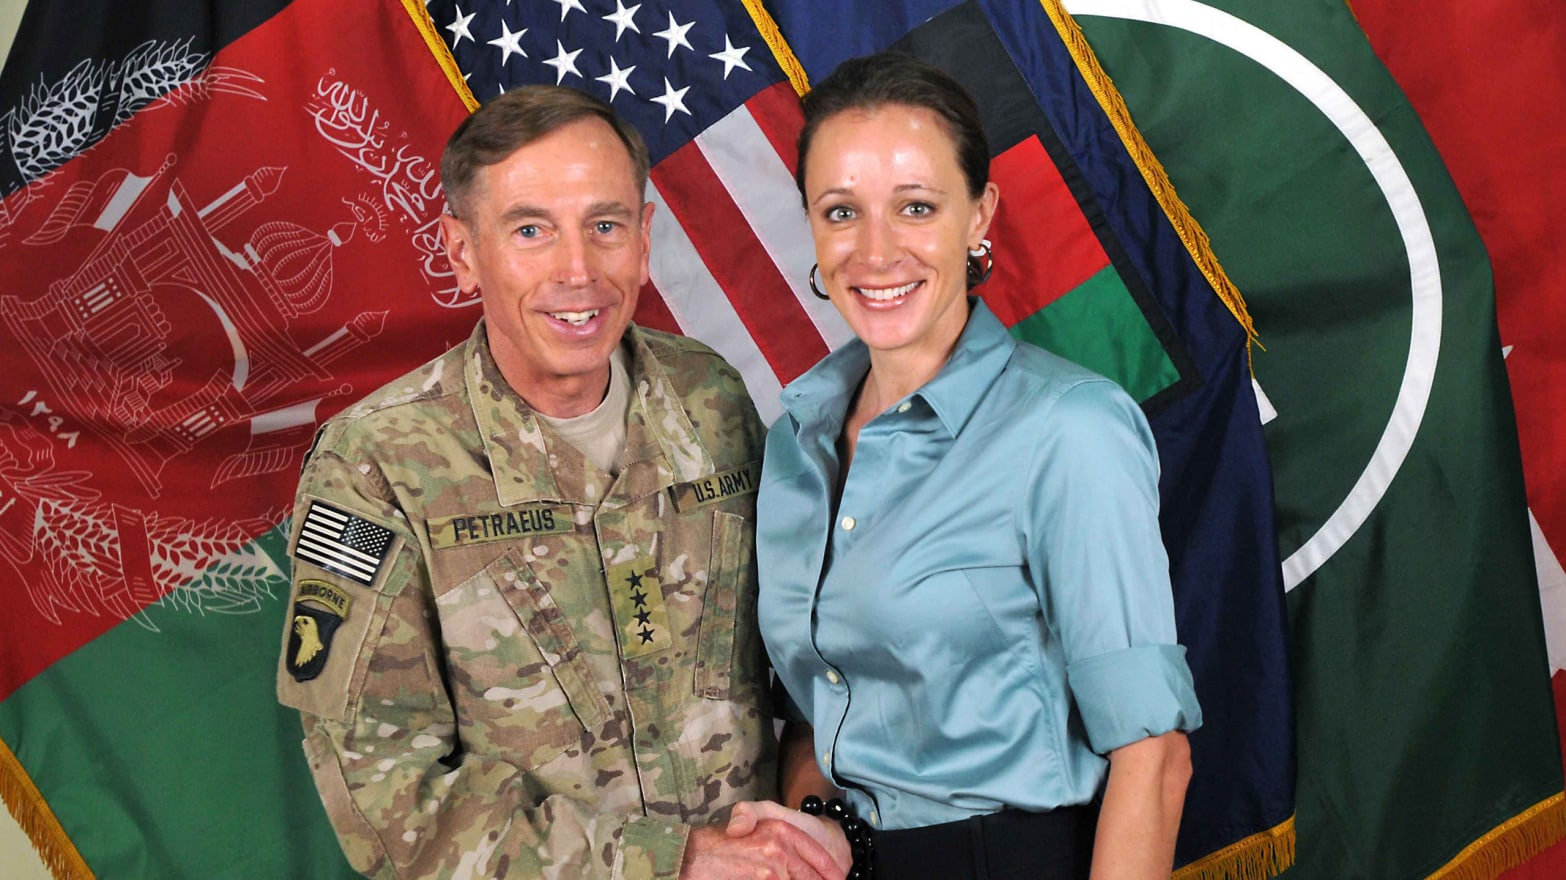 Petraeus Affair Perpetuates Stereotype of Female Journalists